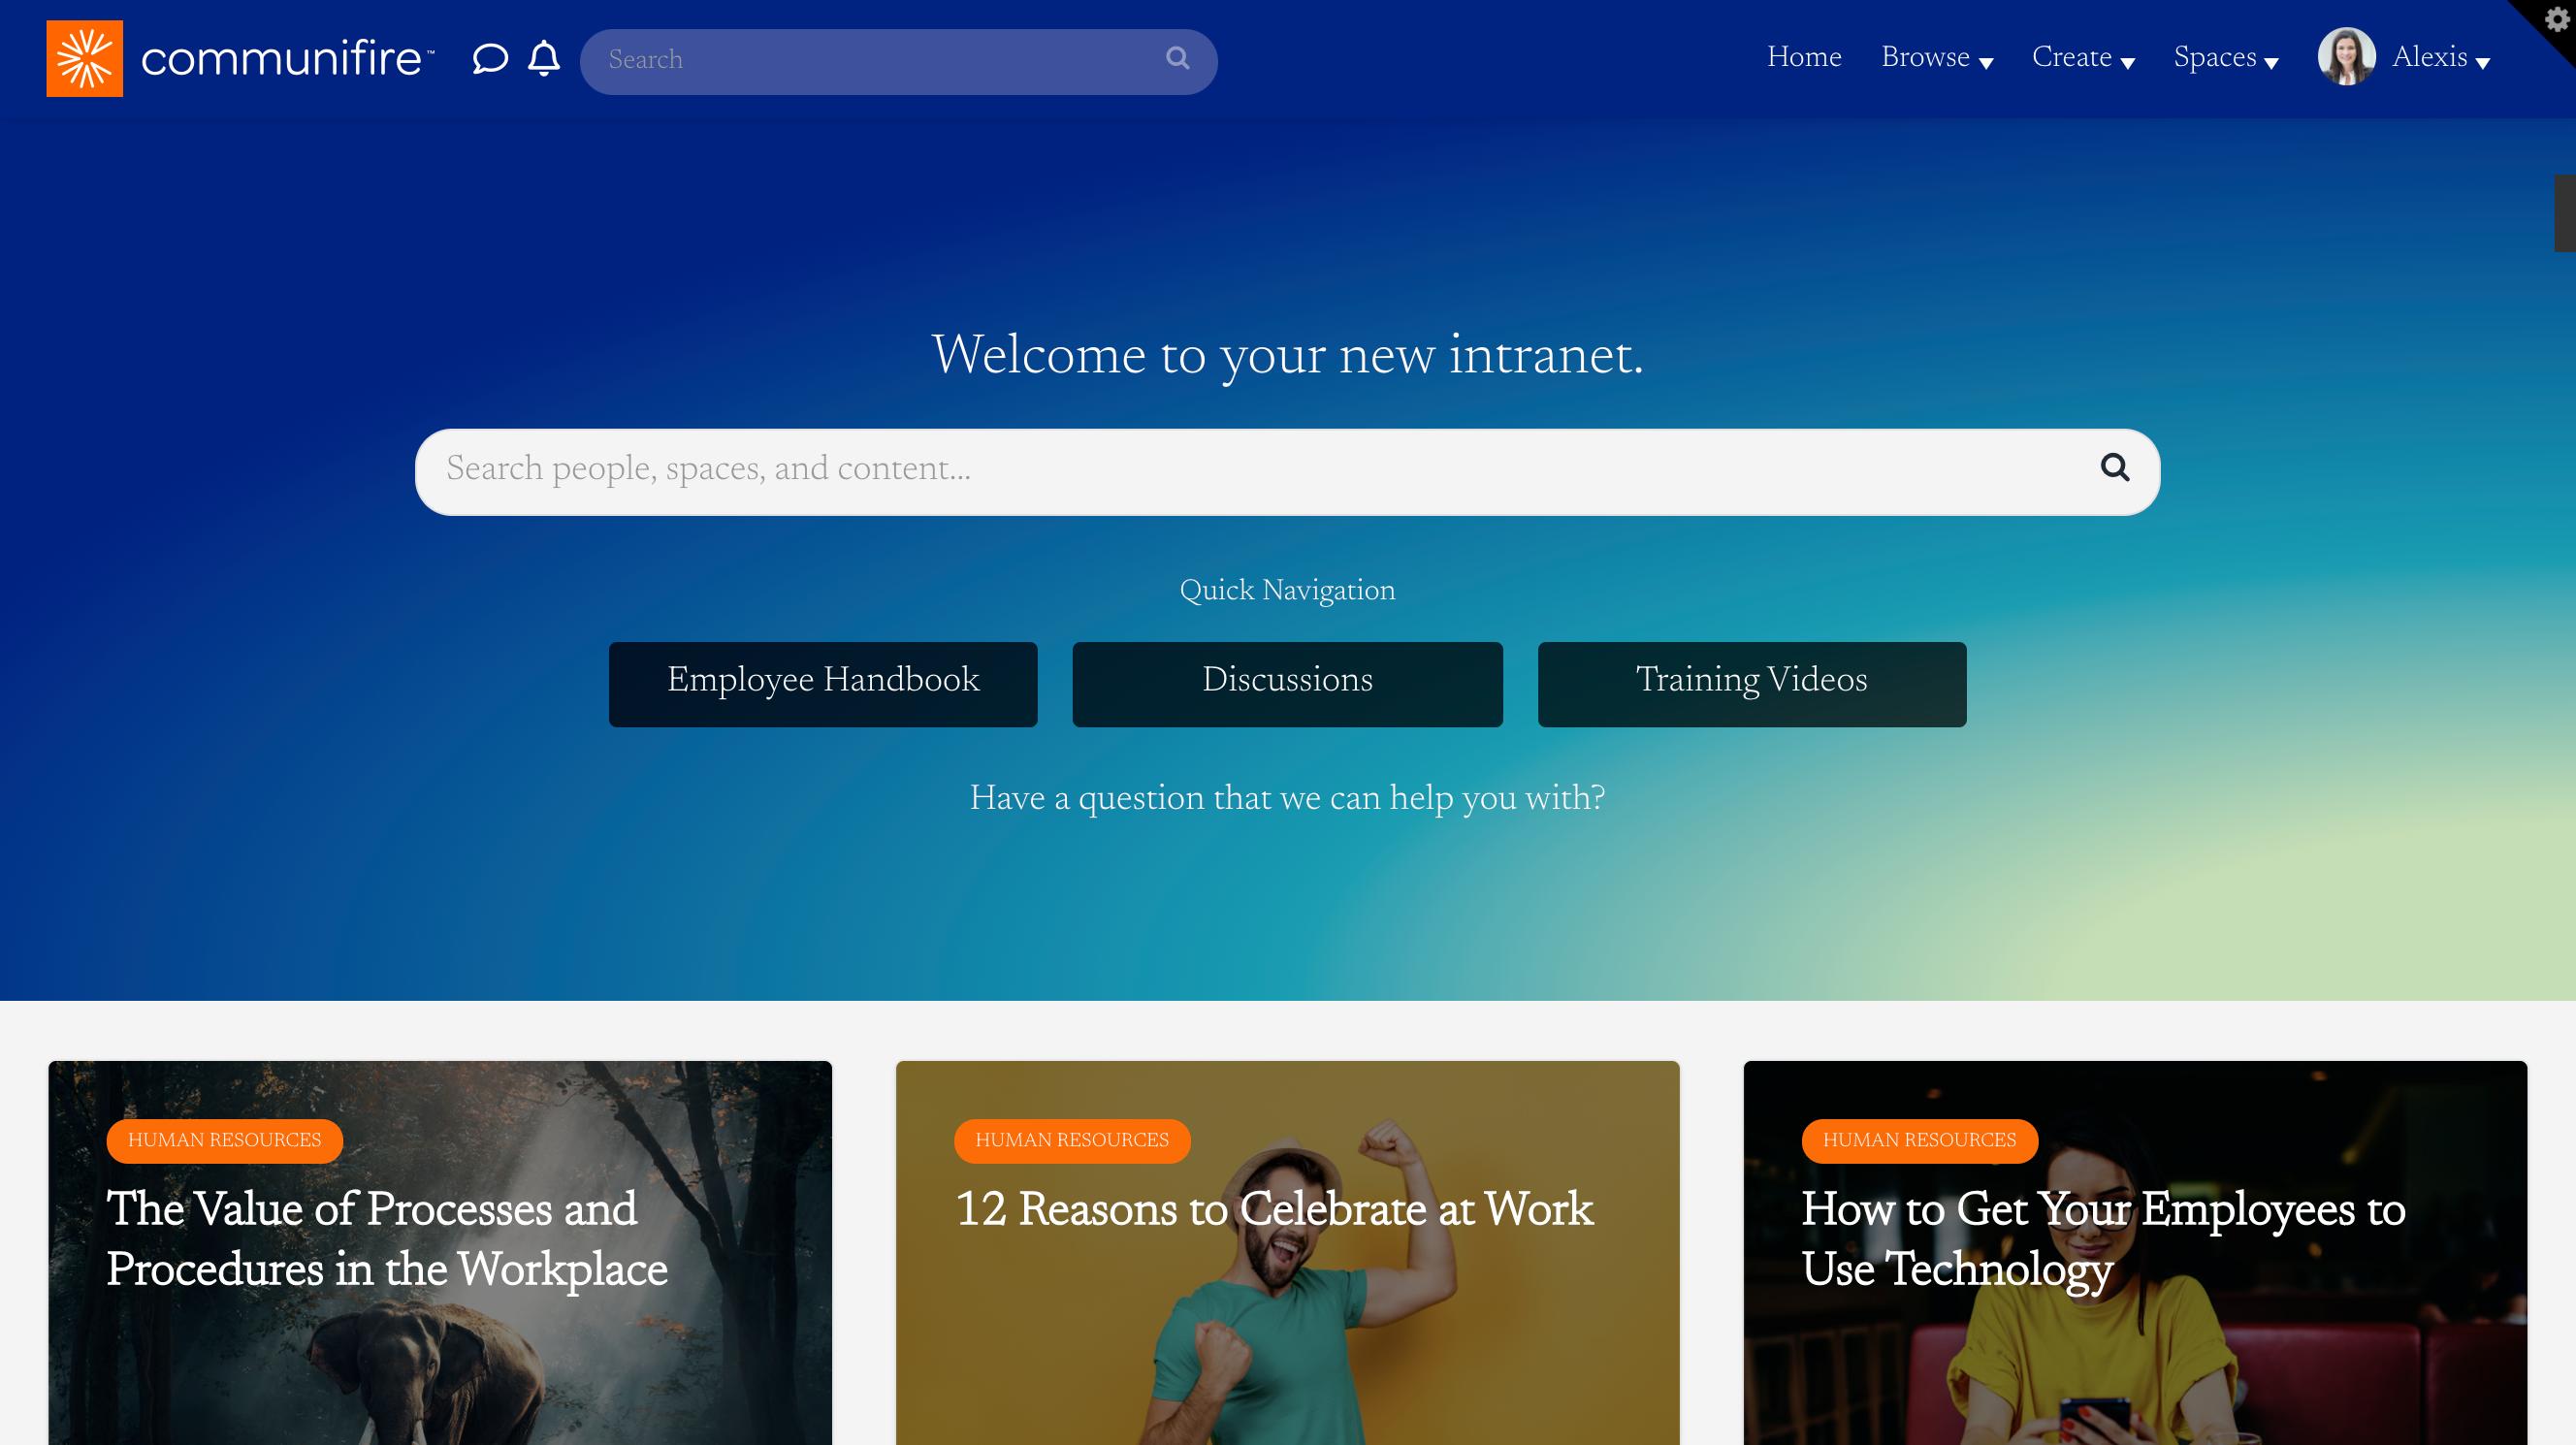 Homepage using Newsreader font